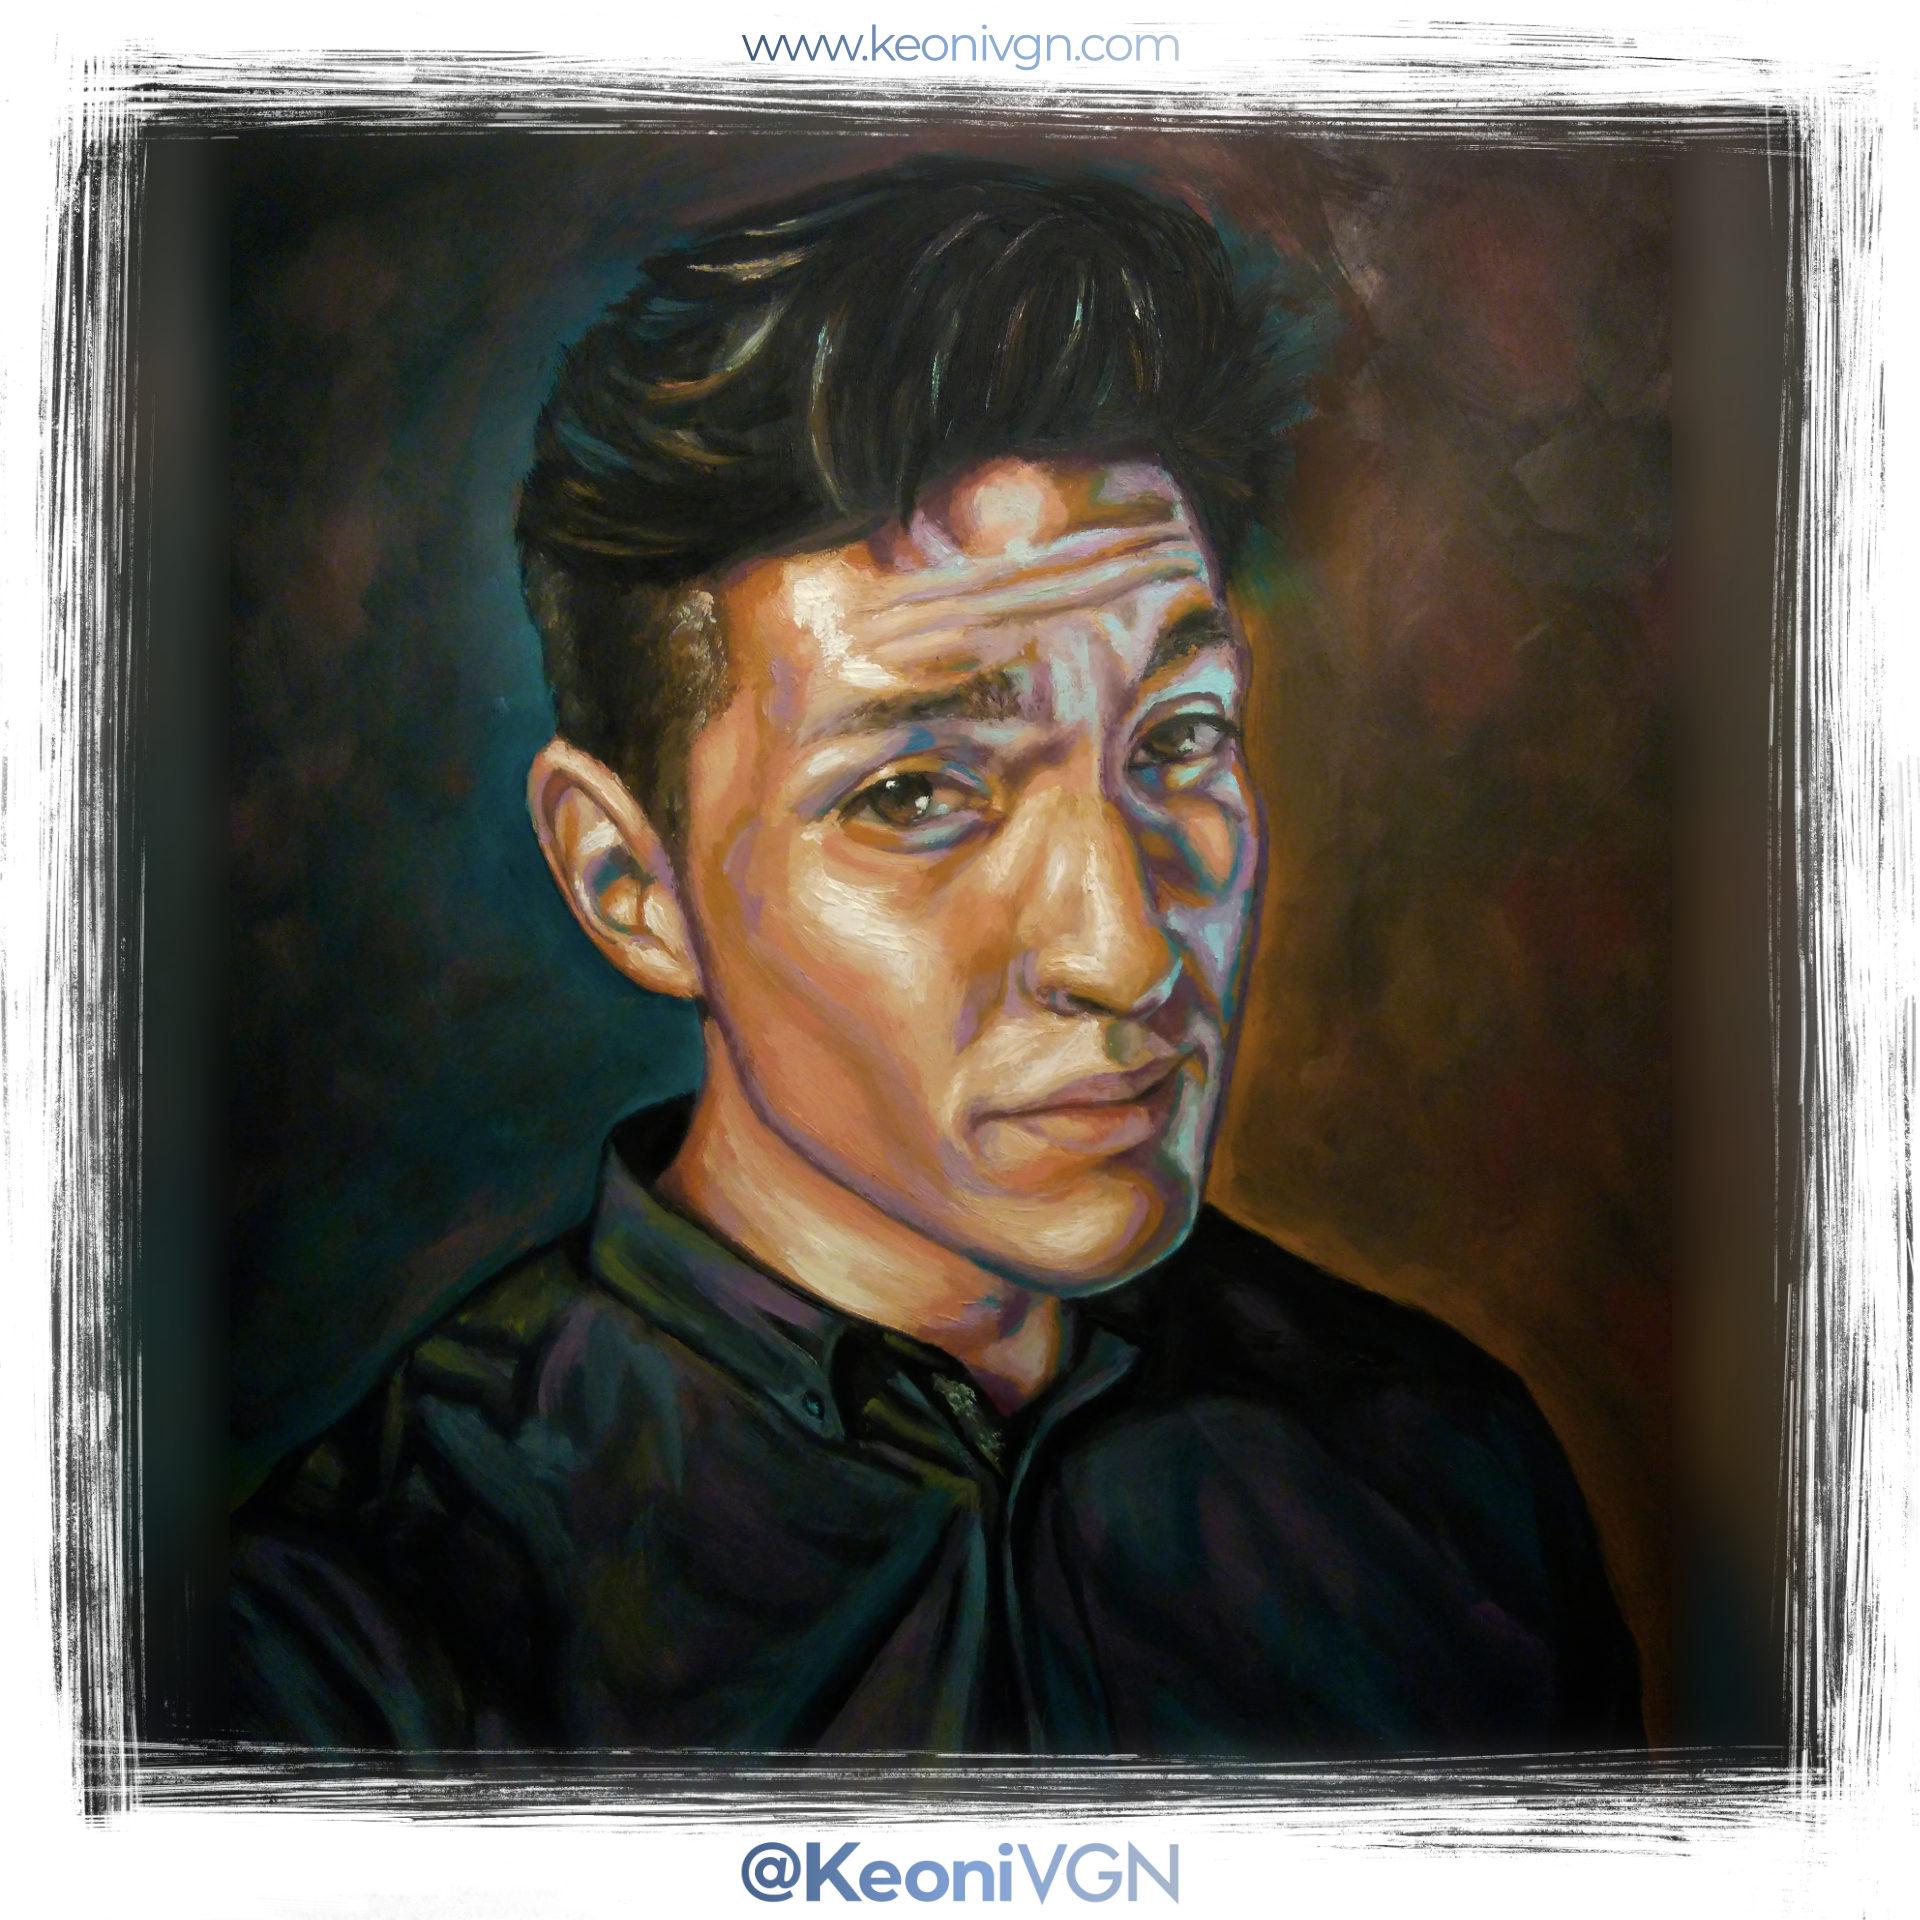 proyecto Self portrait